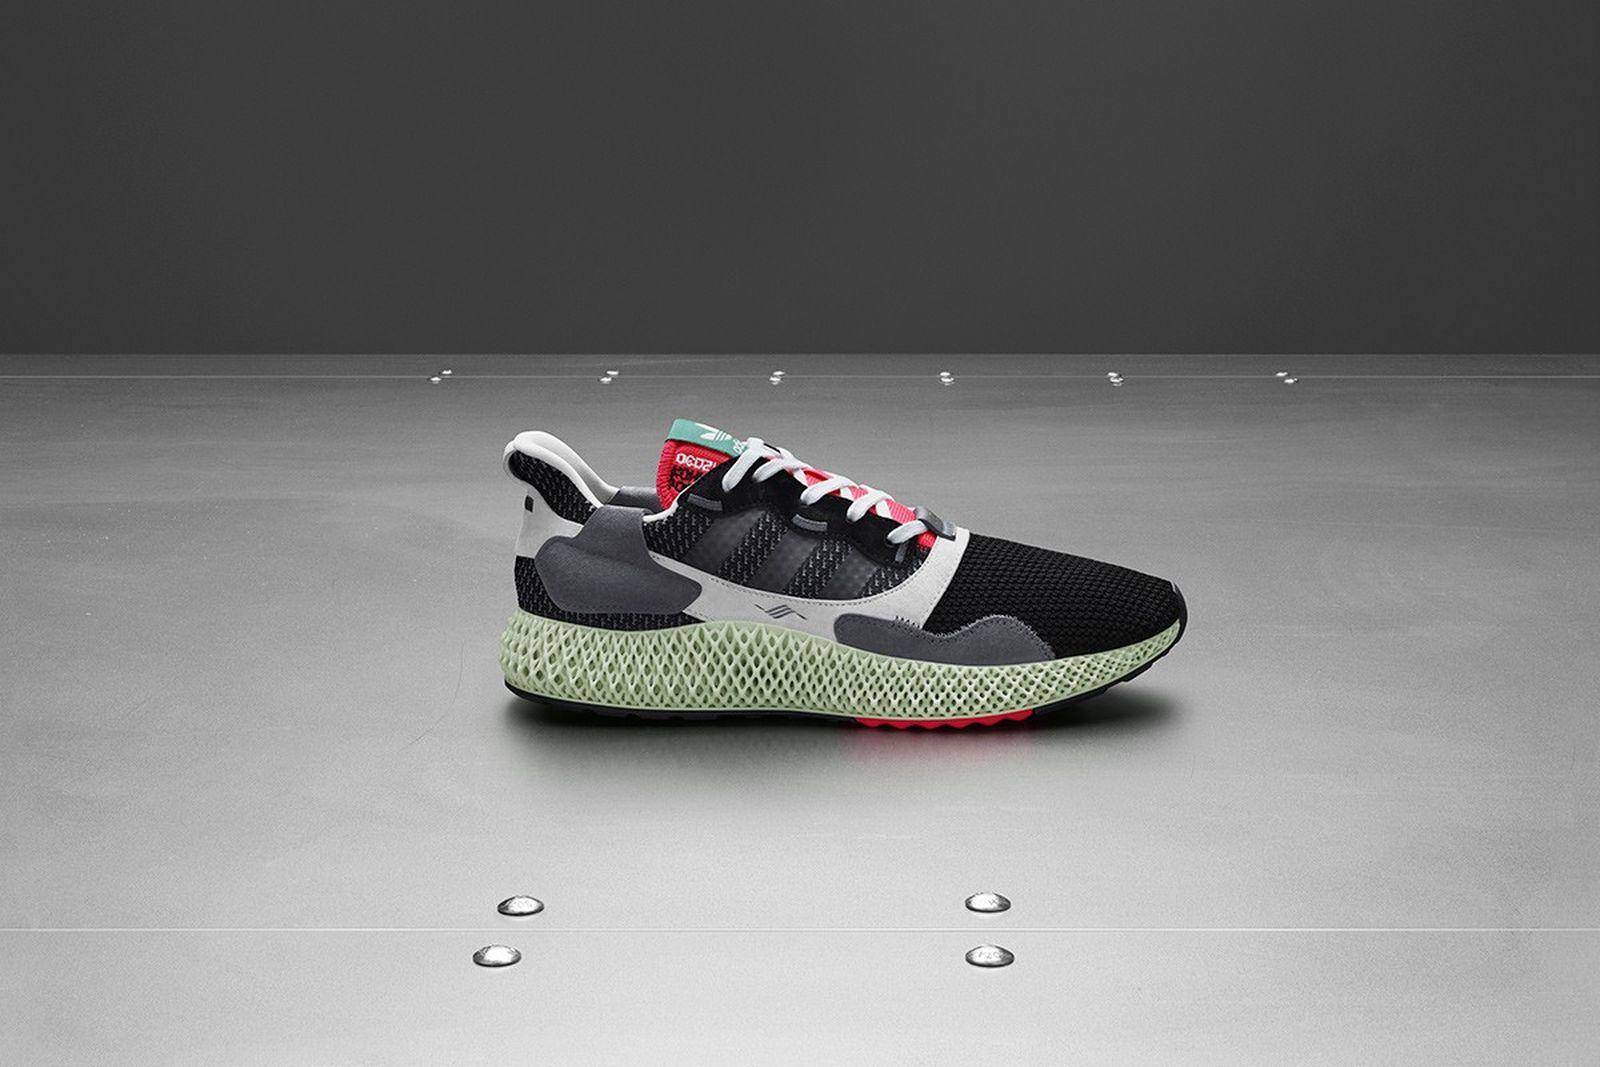 best adidas shoes 2019 april adidas Originals